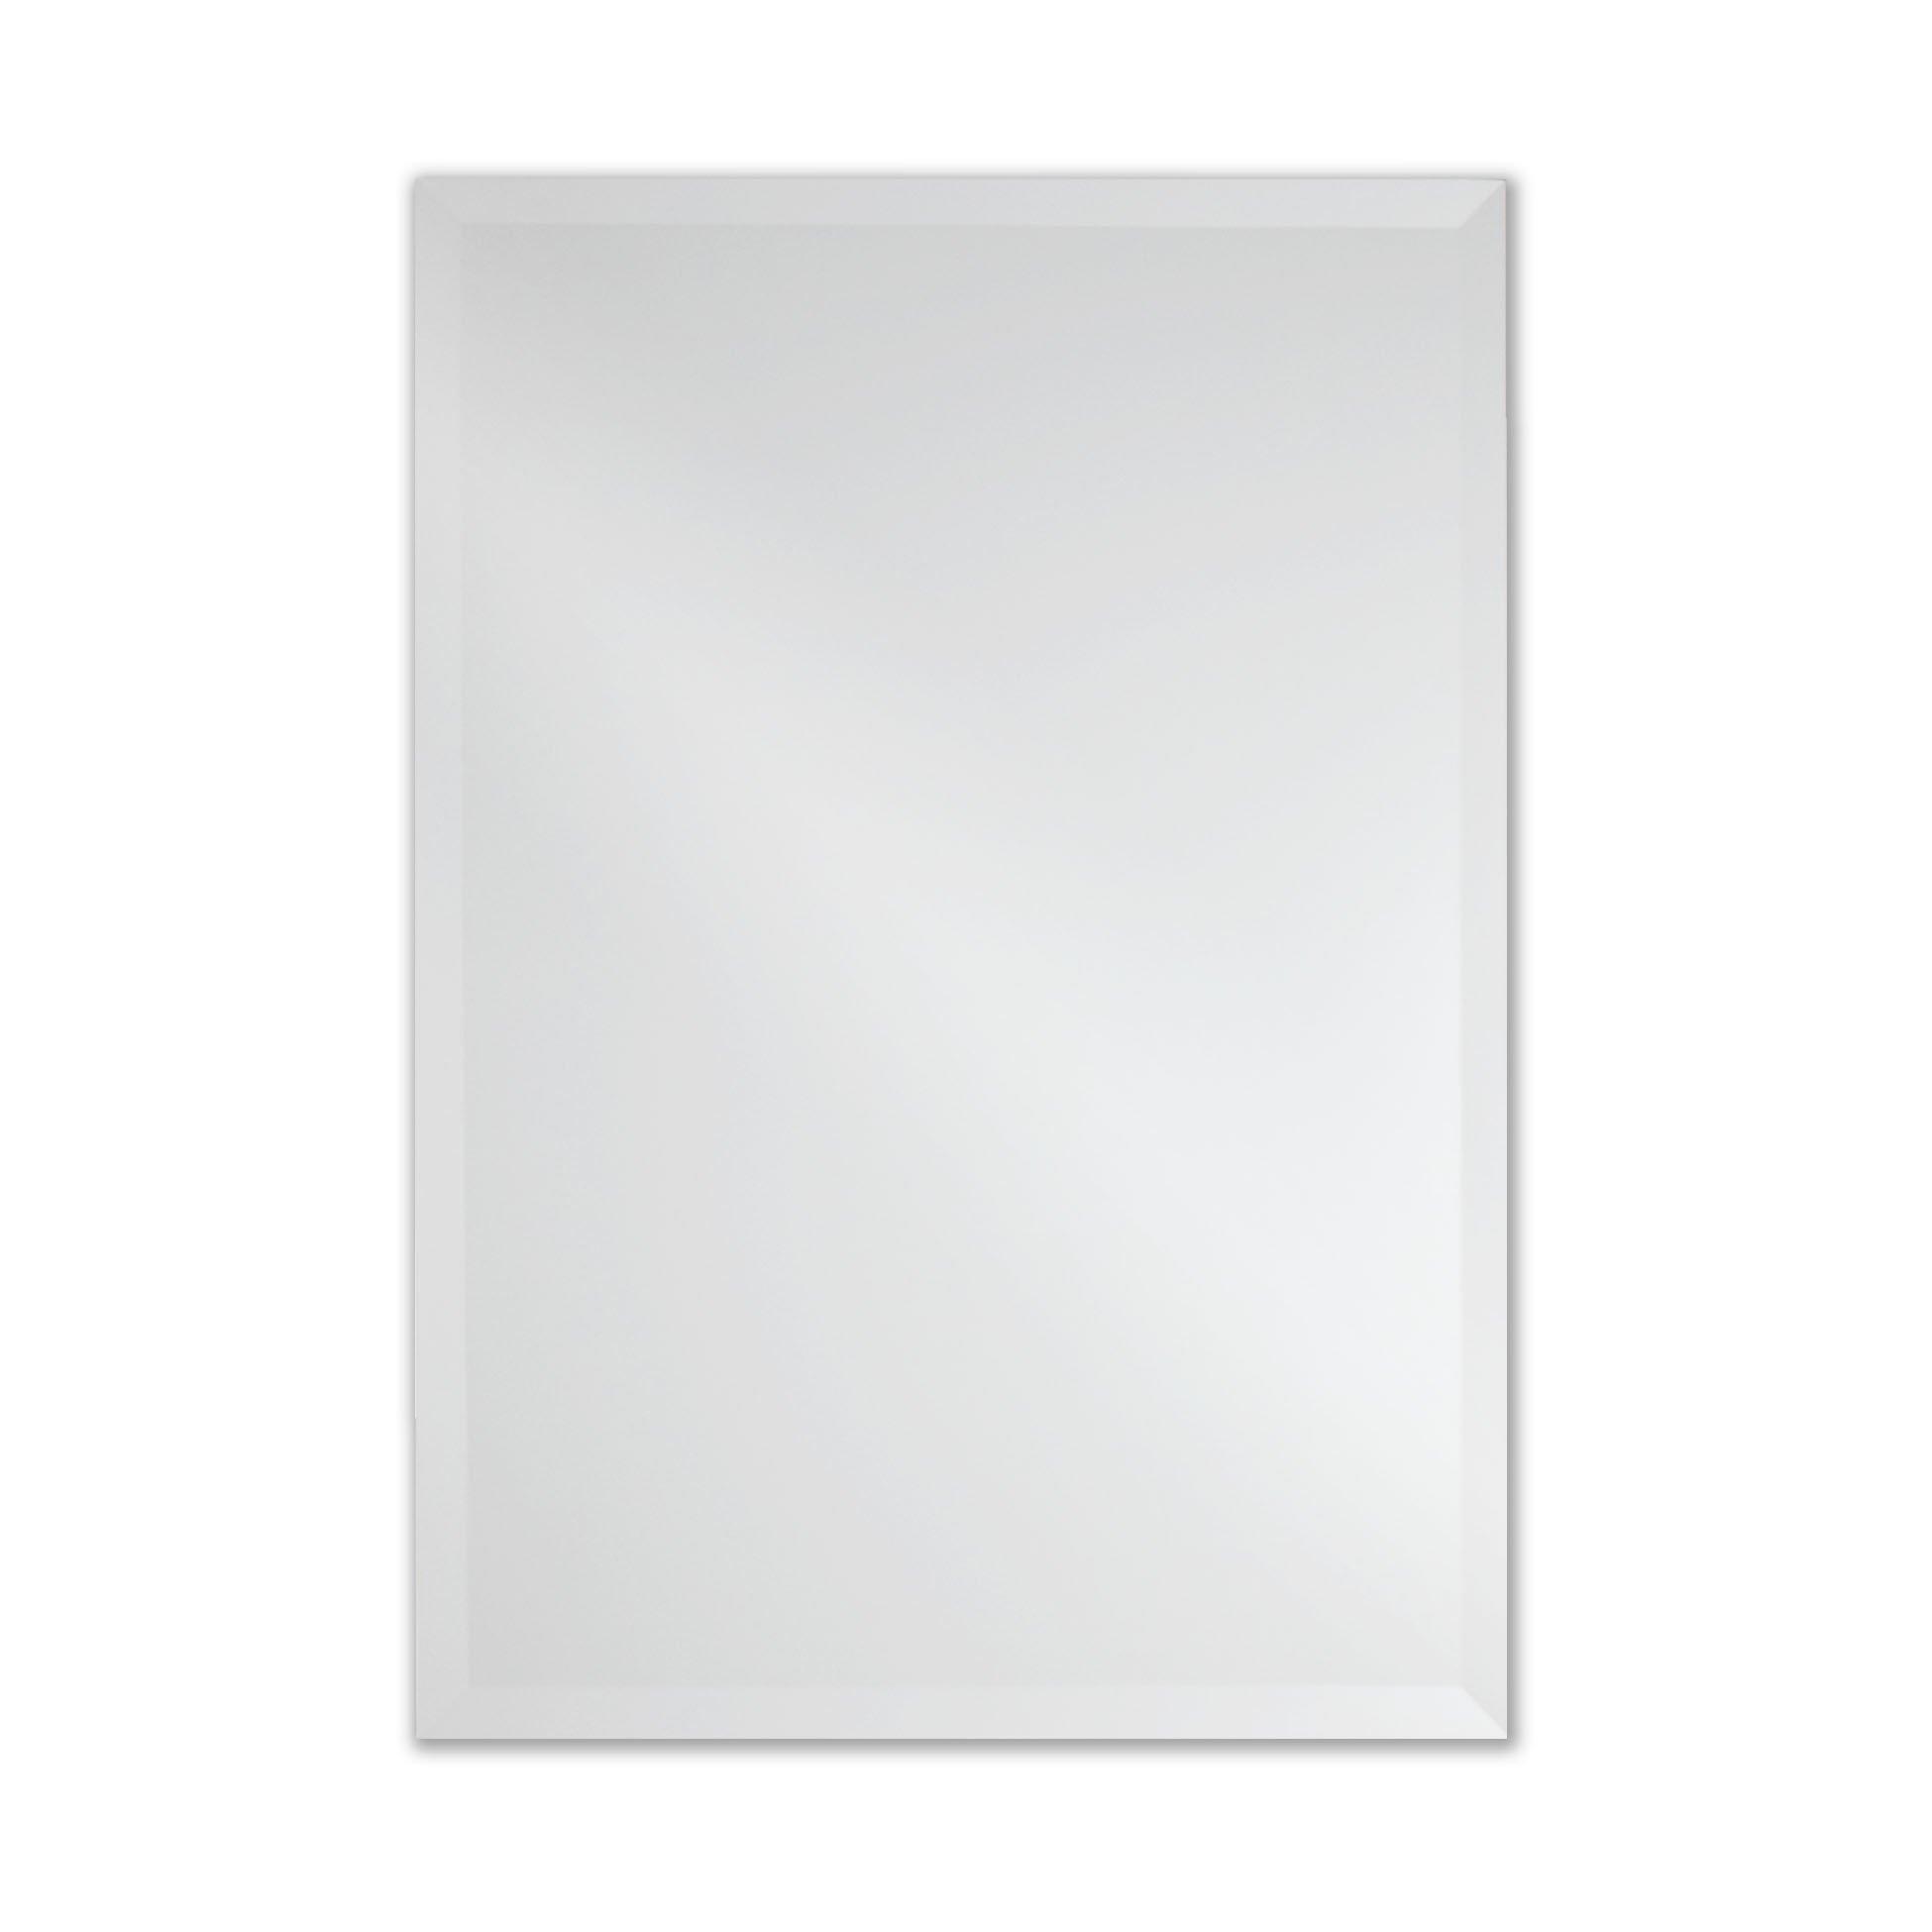 The Better Bevel Frameless Rectangle Wall Mirror | Bathroom, Vanity, Bedroom Rectangular Mirror | 20-inch x 30-inch (Small)